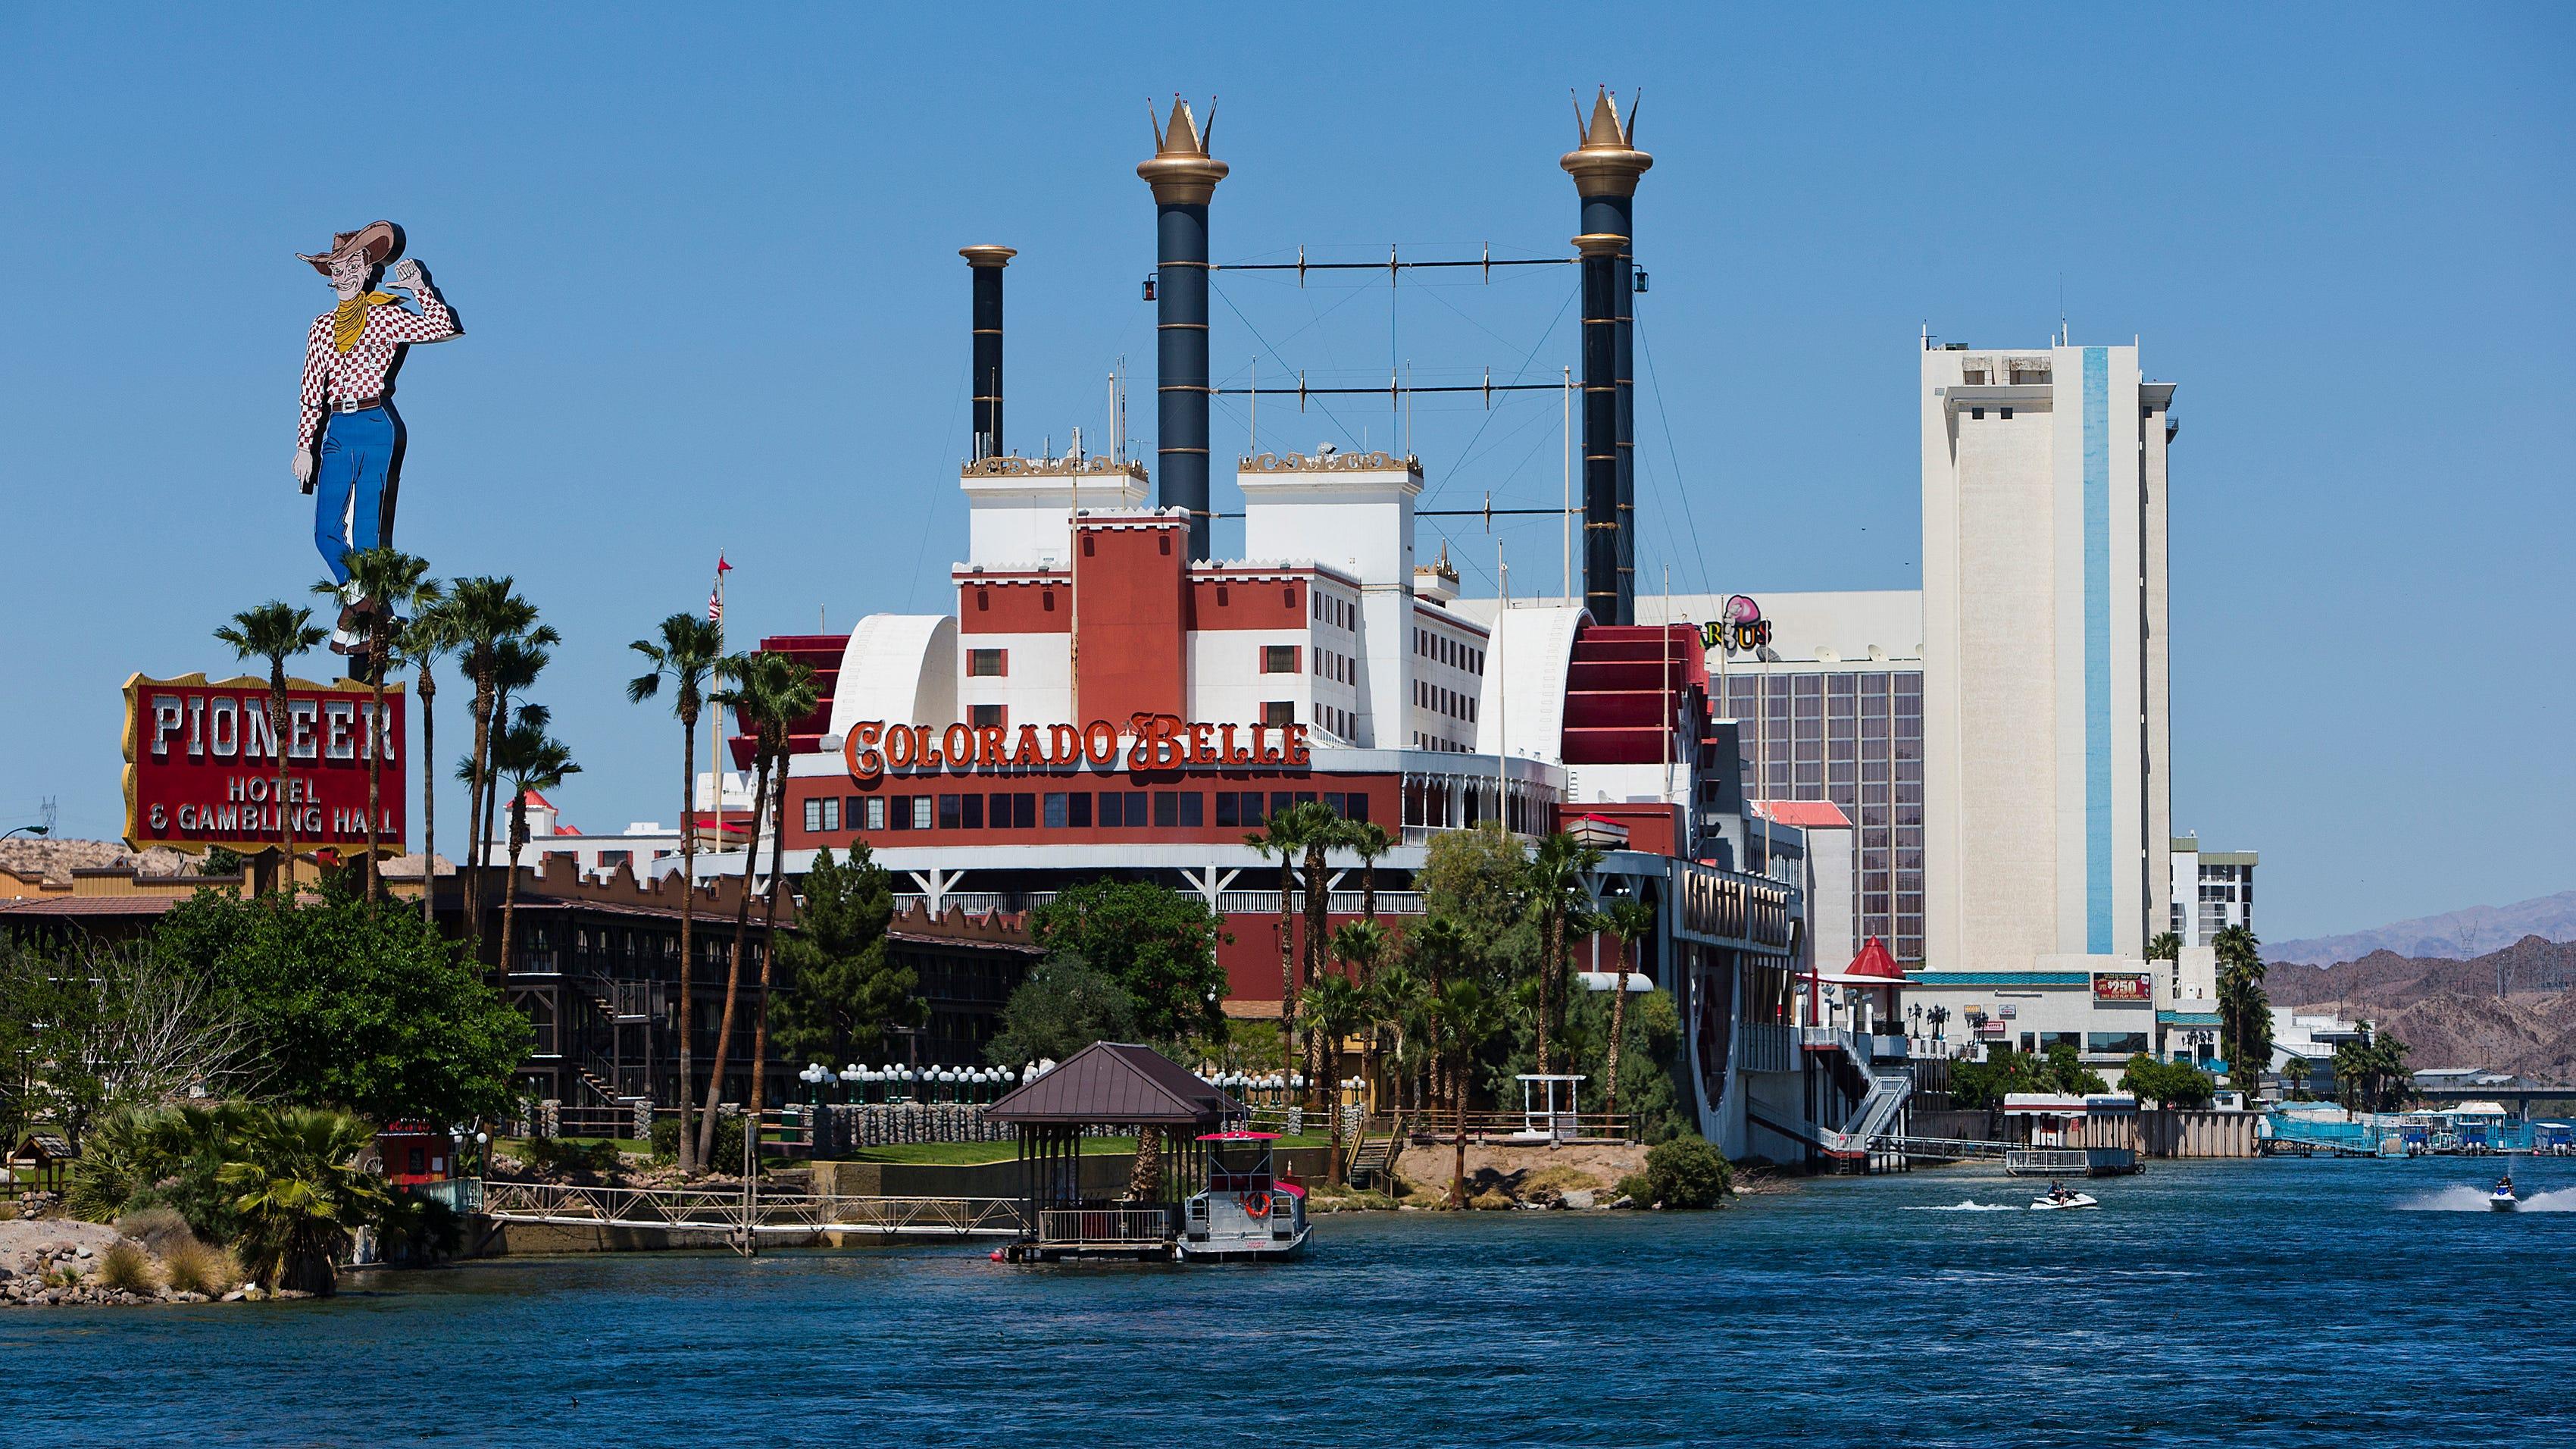 Colorado river casino resort reservations